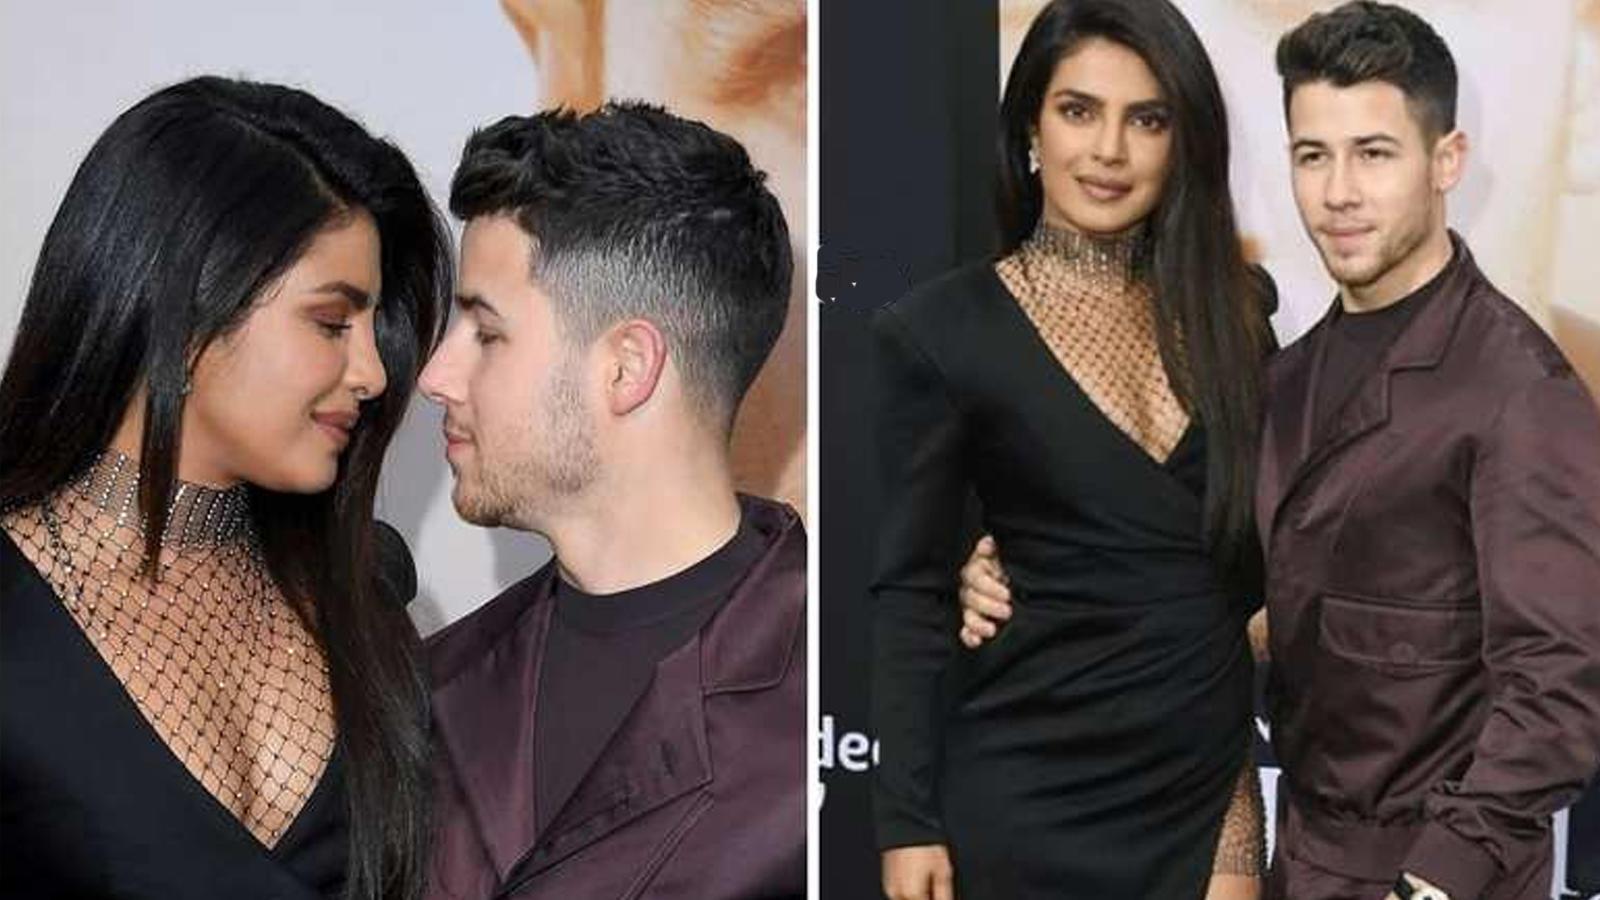 Must watch: When Priyanka Chopra made Nick Jonas cry